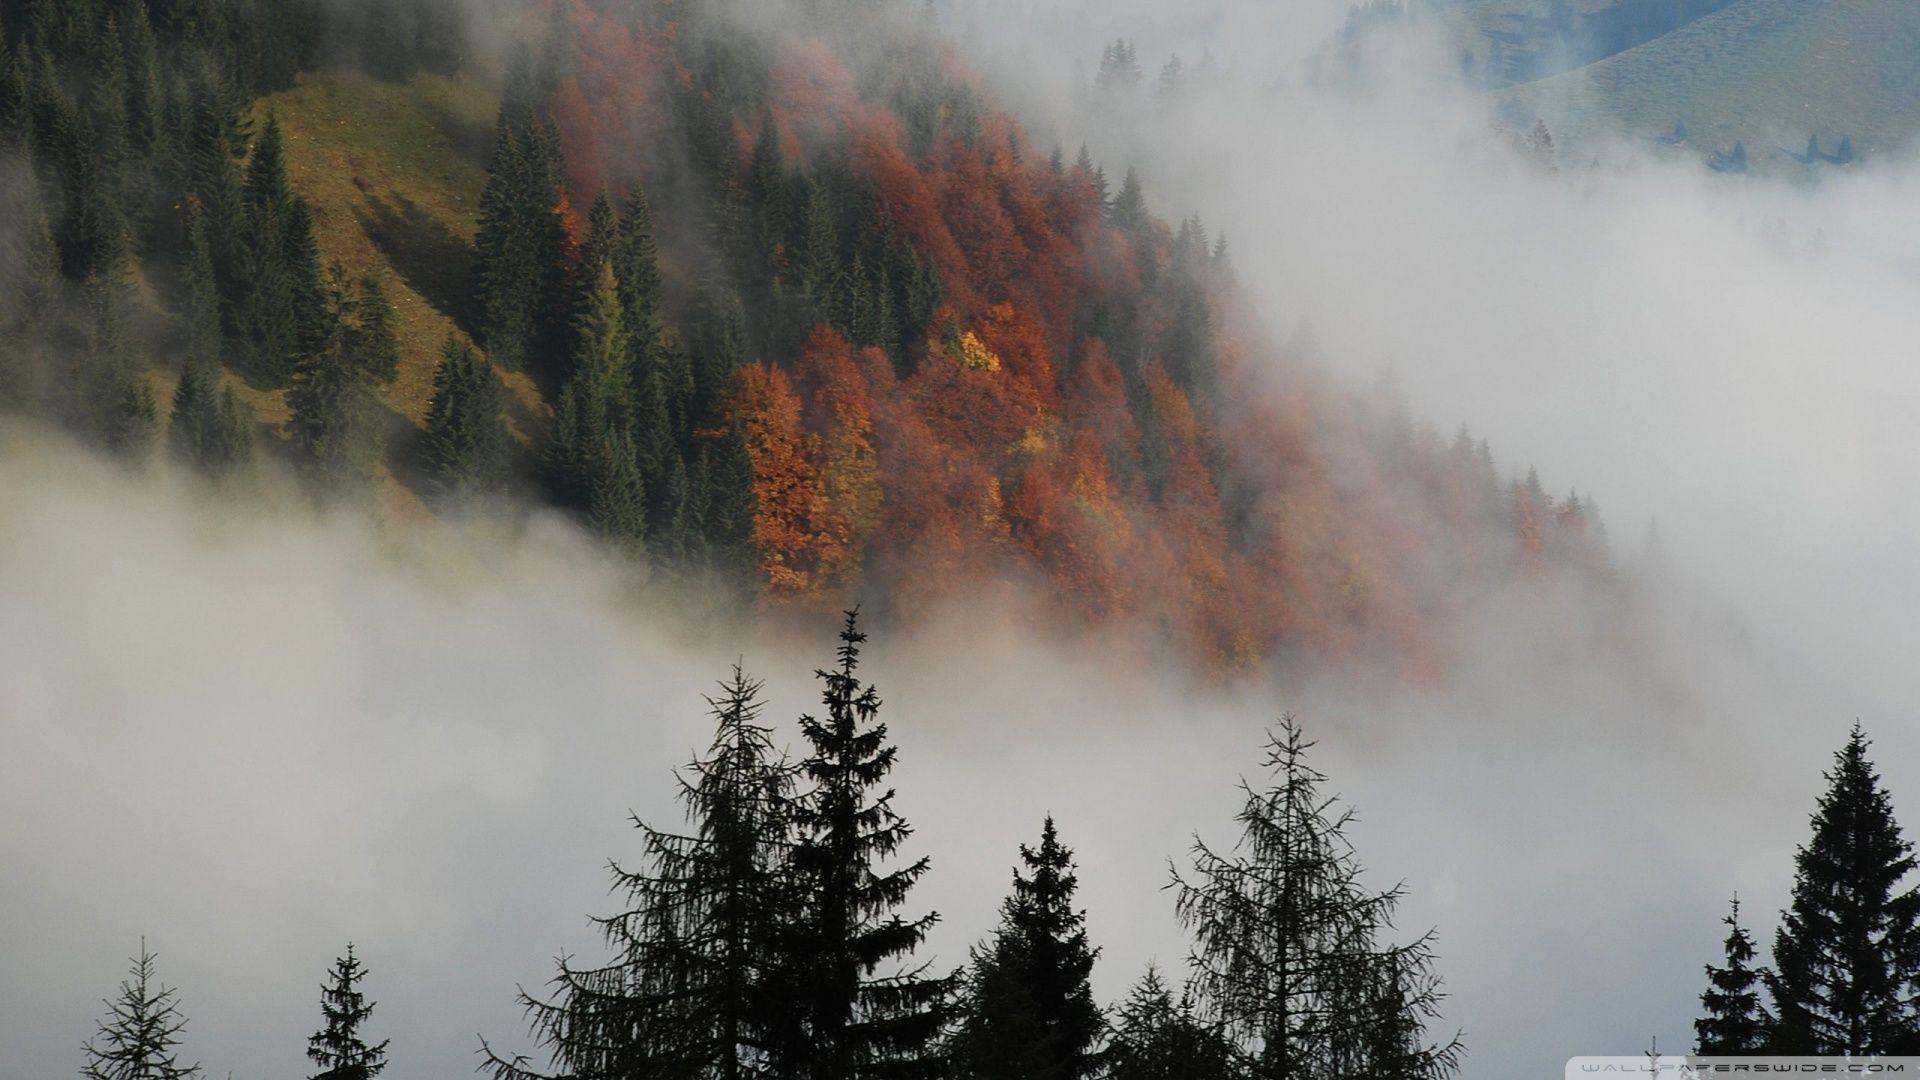 Foggy mountain forest (1920 x 1080) Foggy mountains